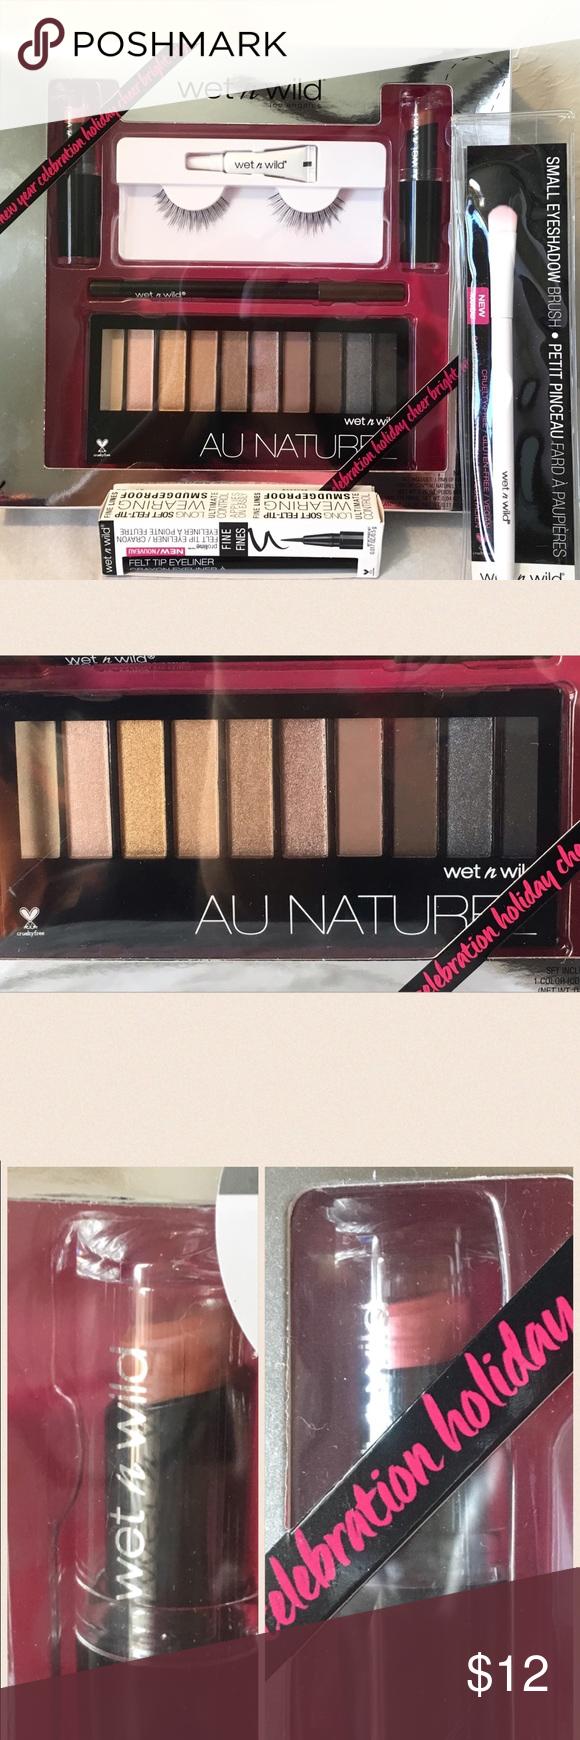 Wet N Wild Au Naturel Gift Set Eyeliner Brush New Palette